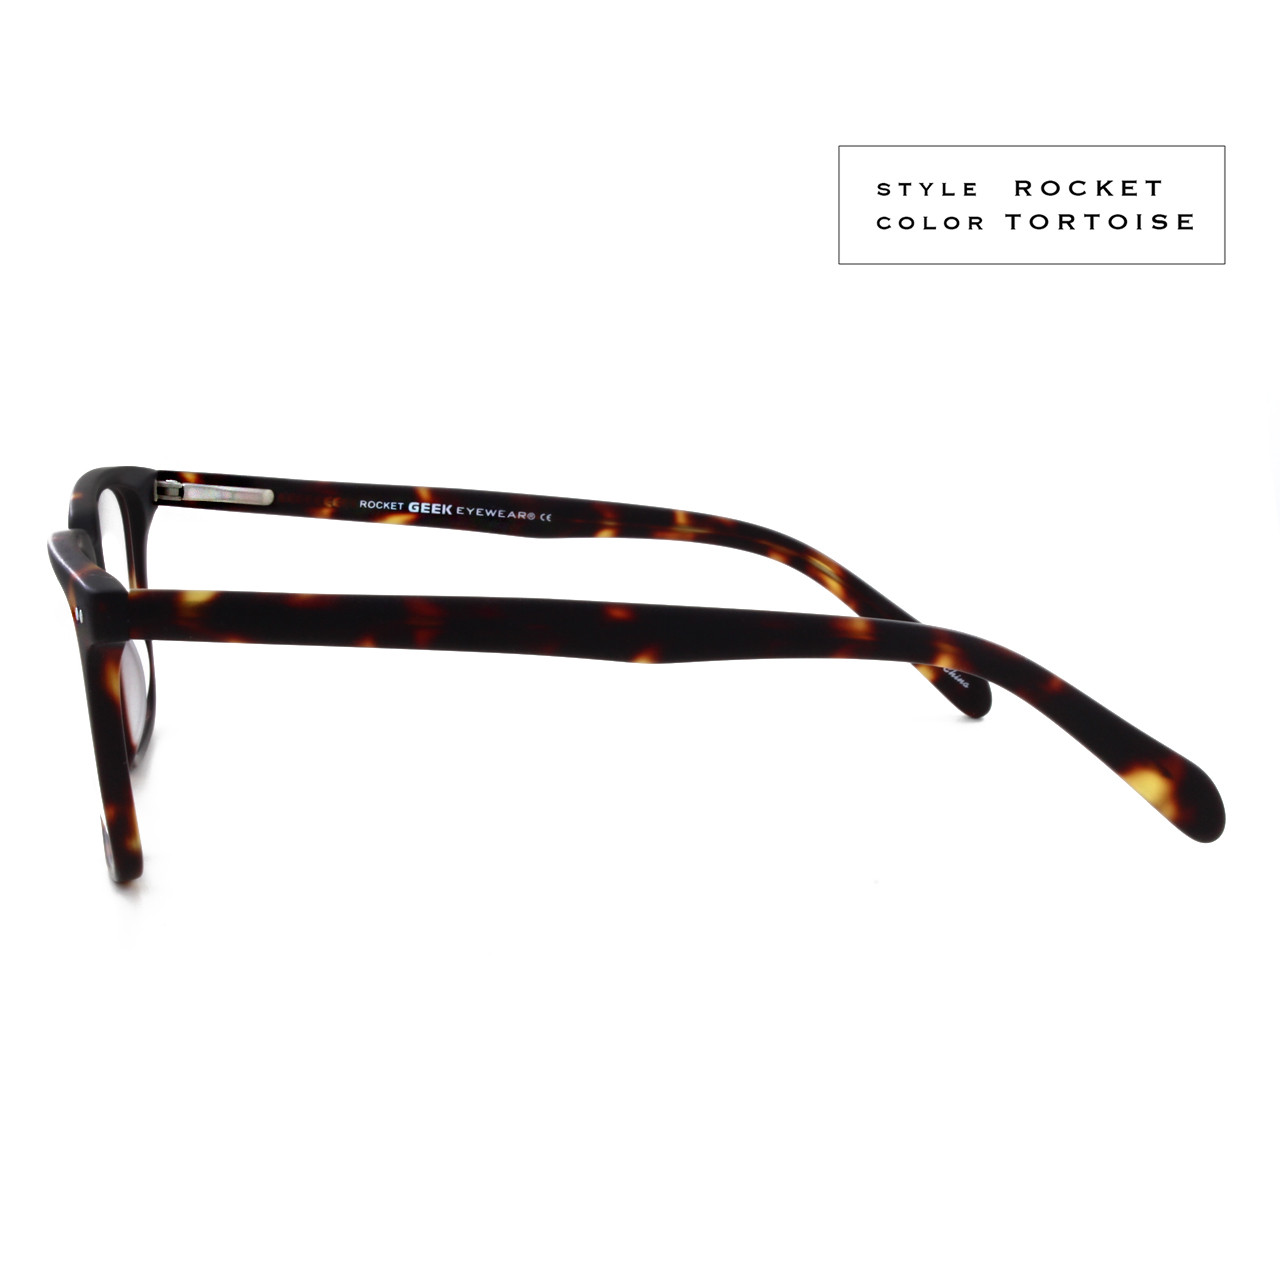 GEEK Eyewear Style Rocket